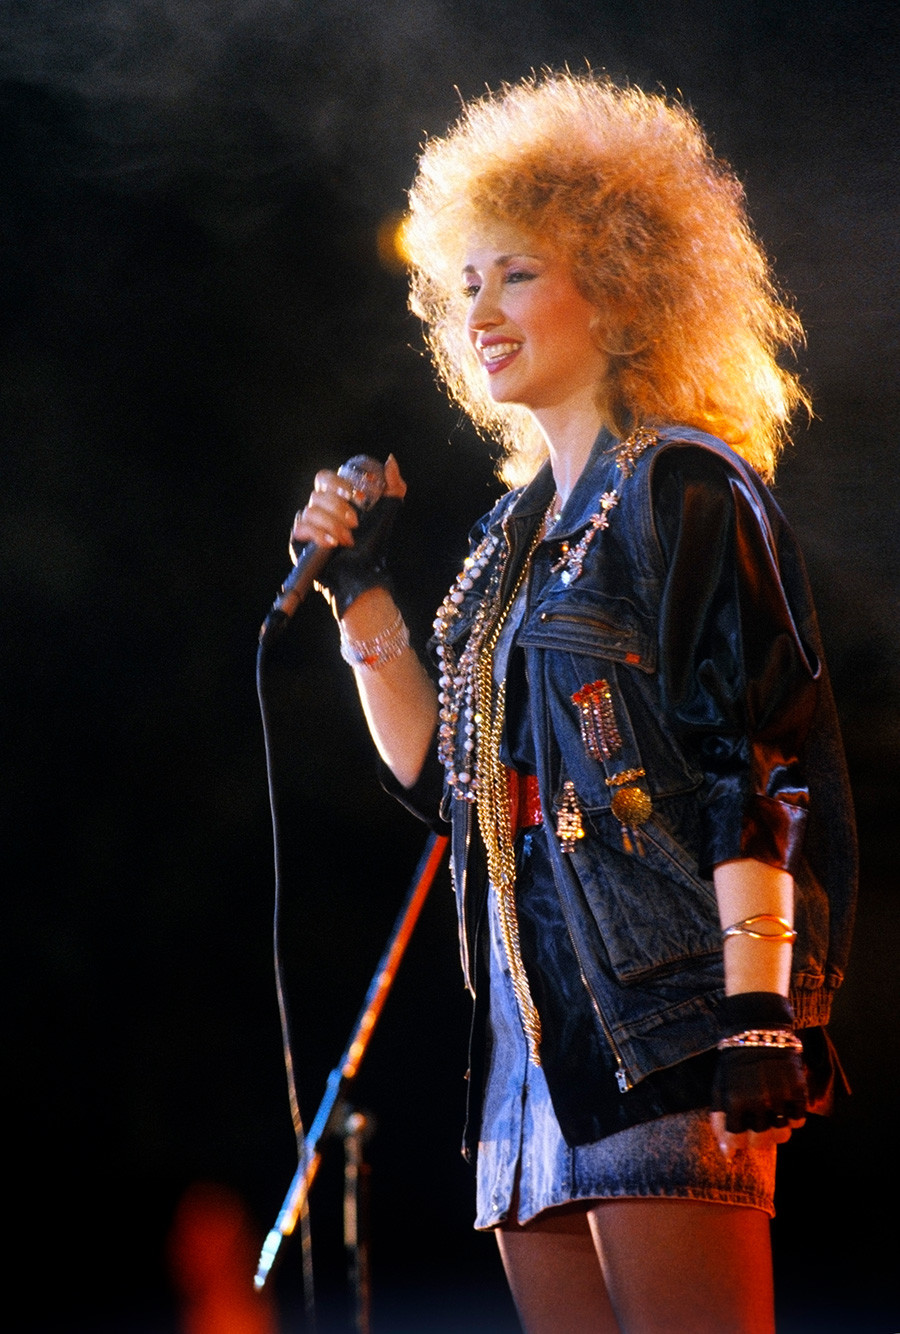 Singer Irina Allegrova.